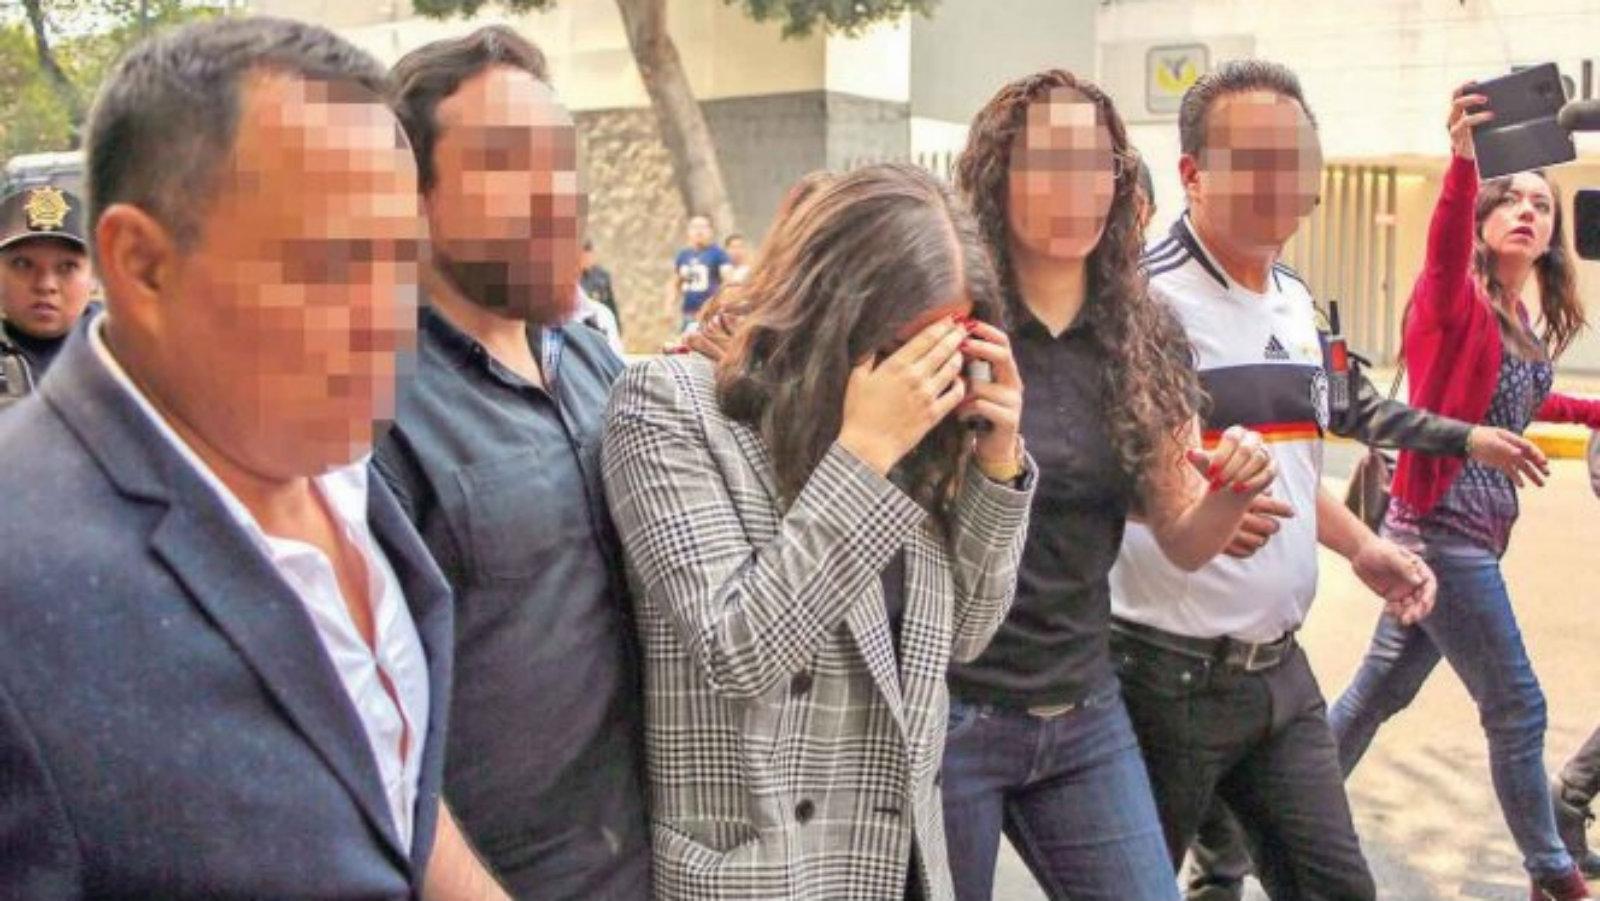 Miss Mónica Detención no pactada Colaboración ciudadana PGJ CDMX